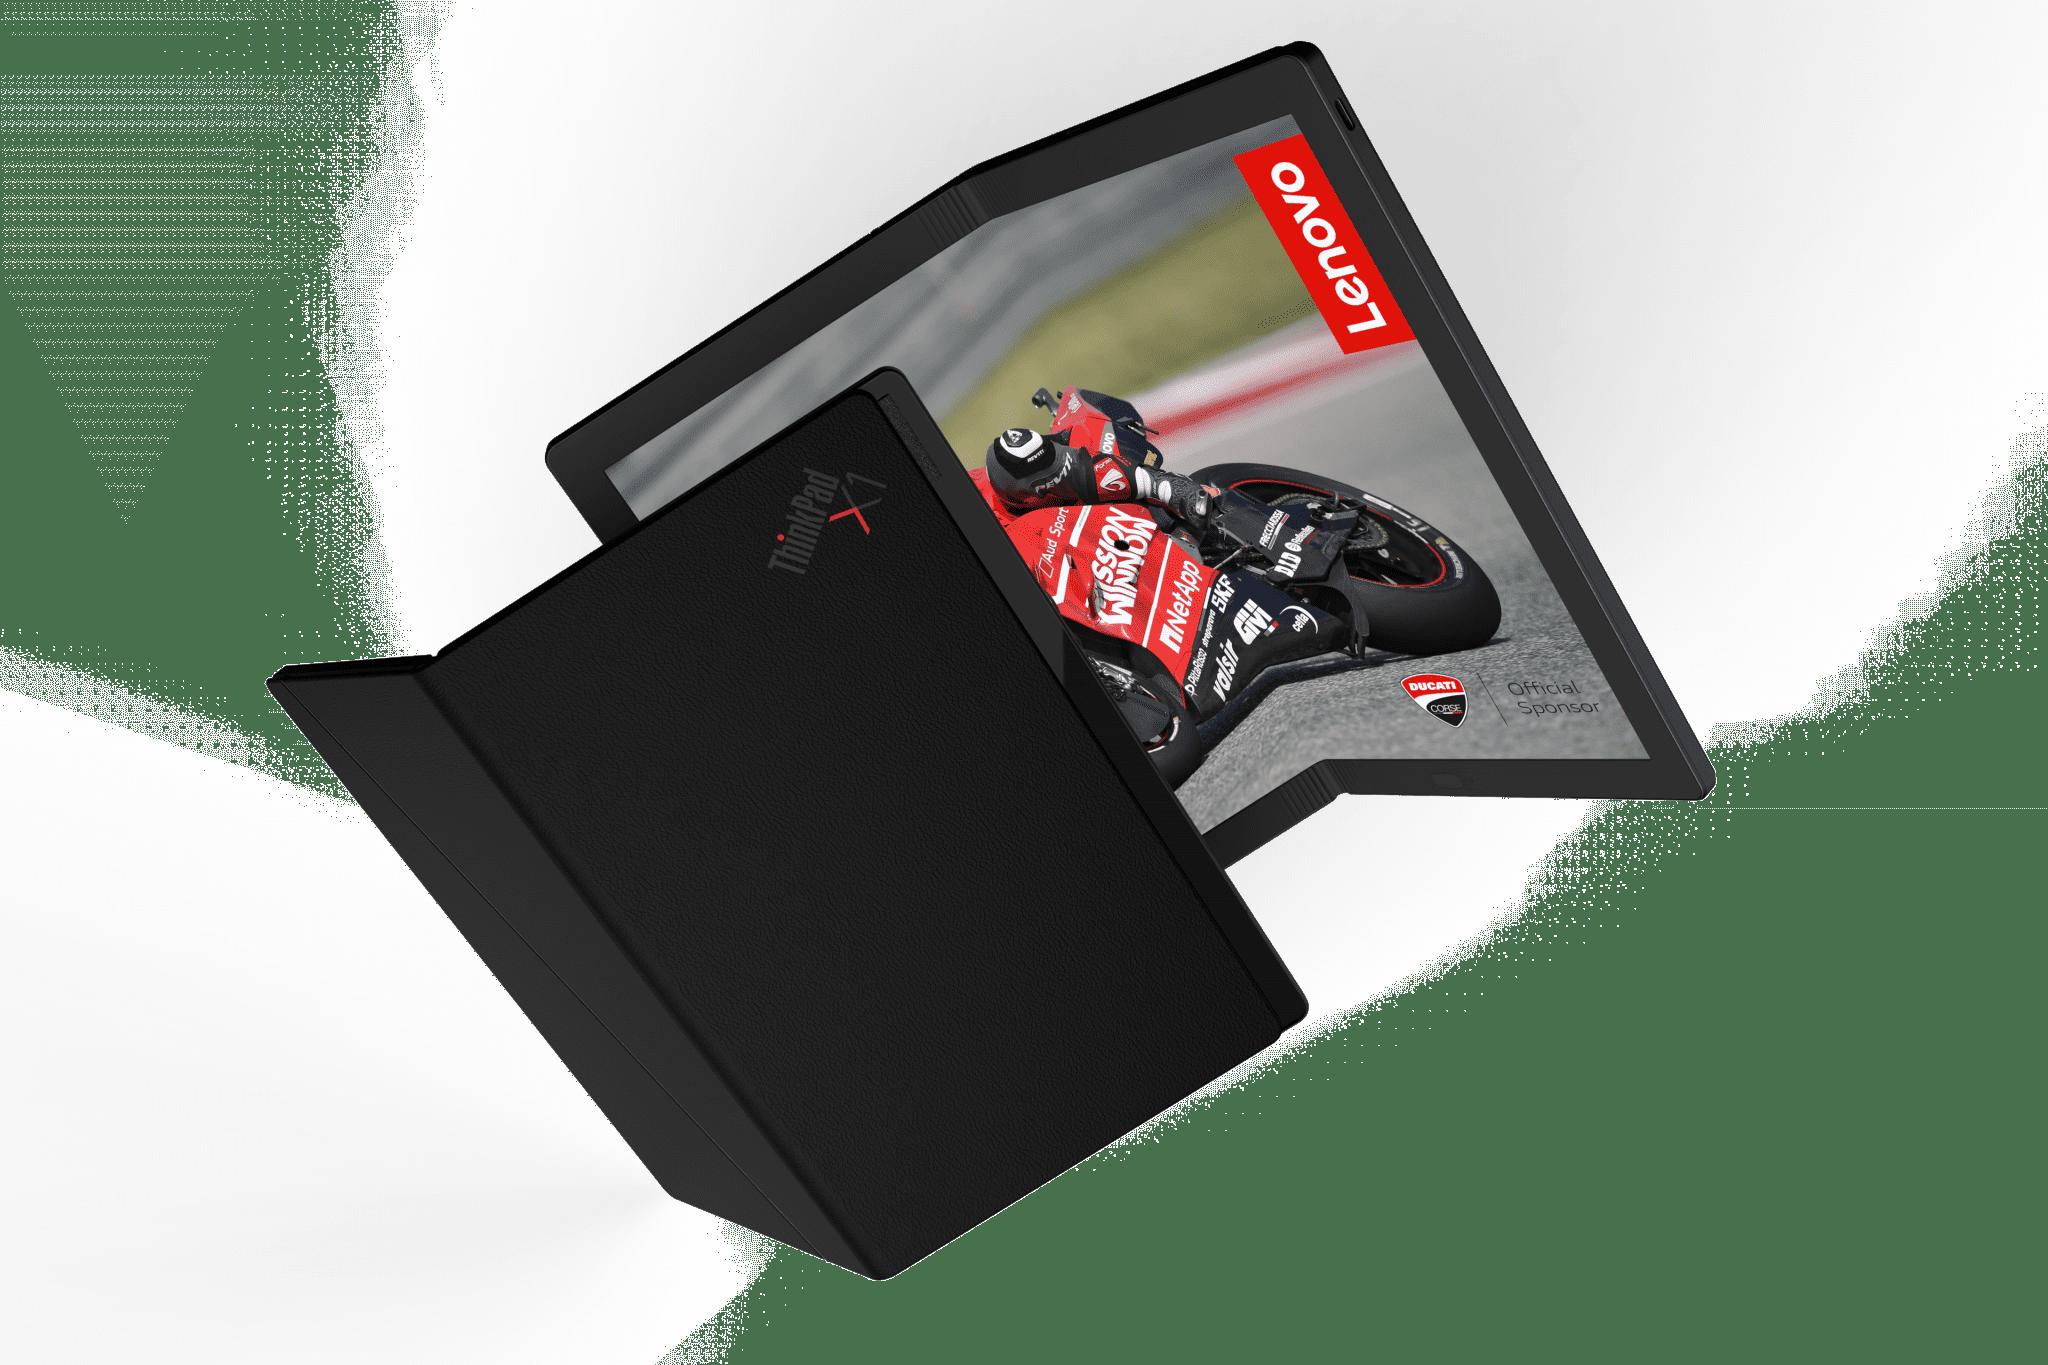 Lenovo a prezentat Foldable PC, primul laptop pliabil din lume